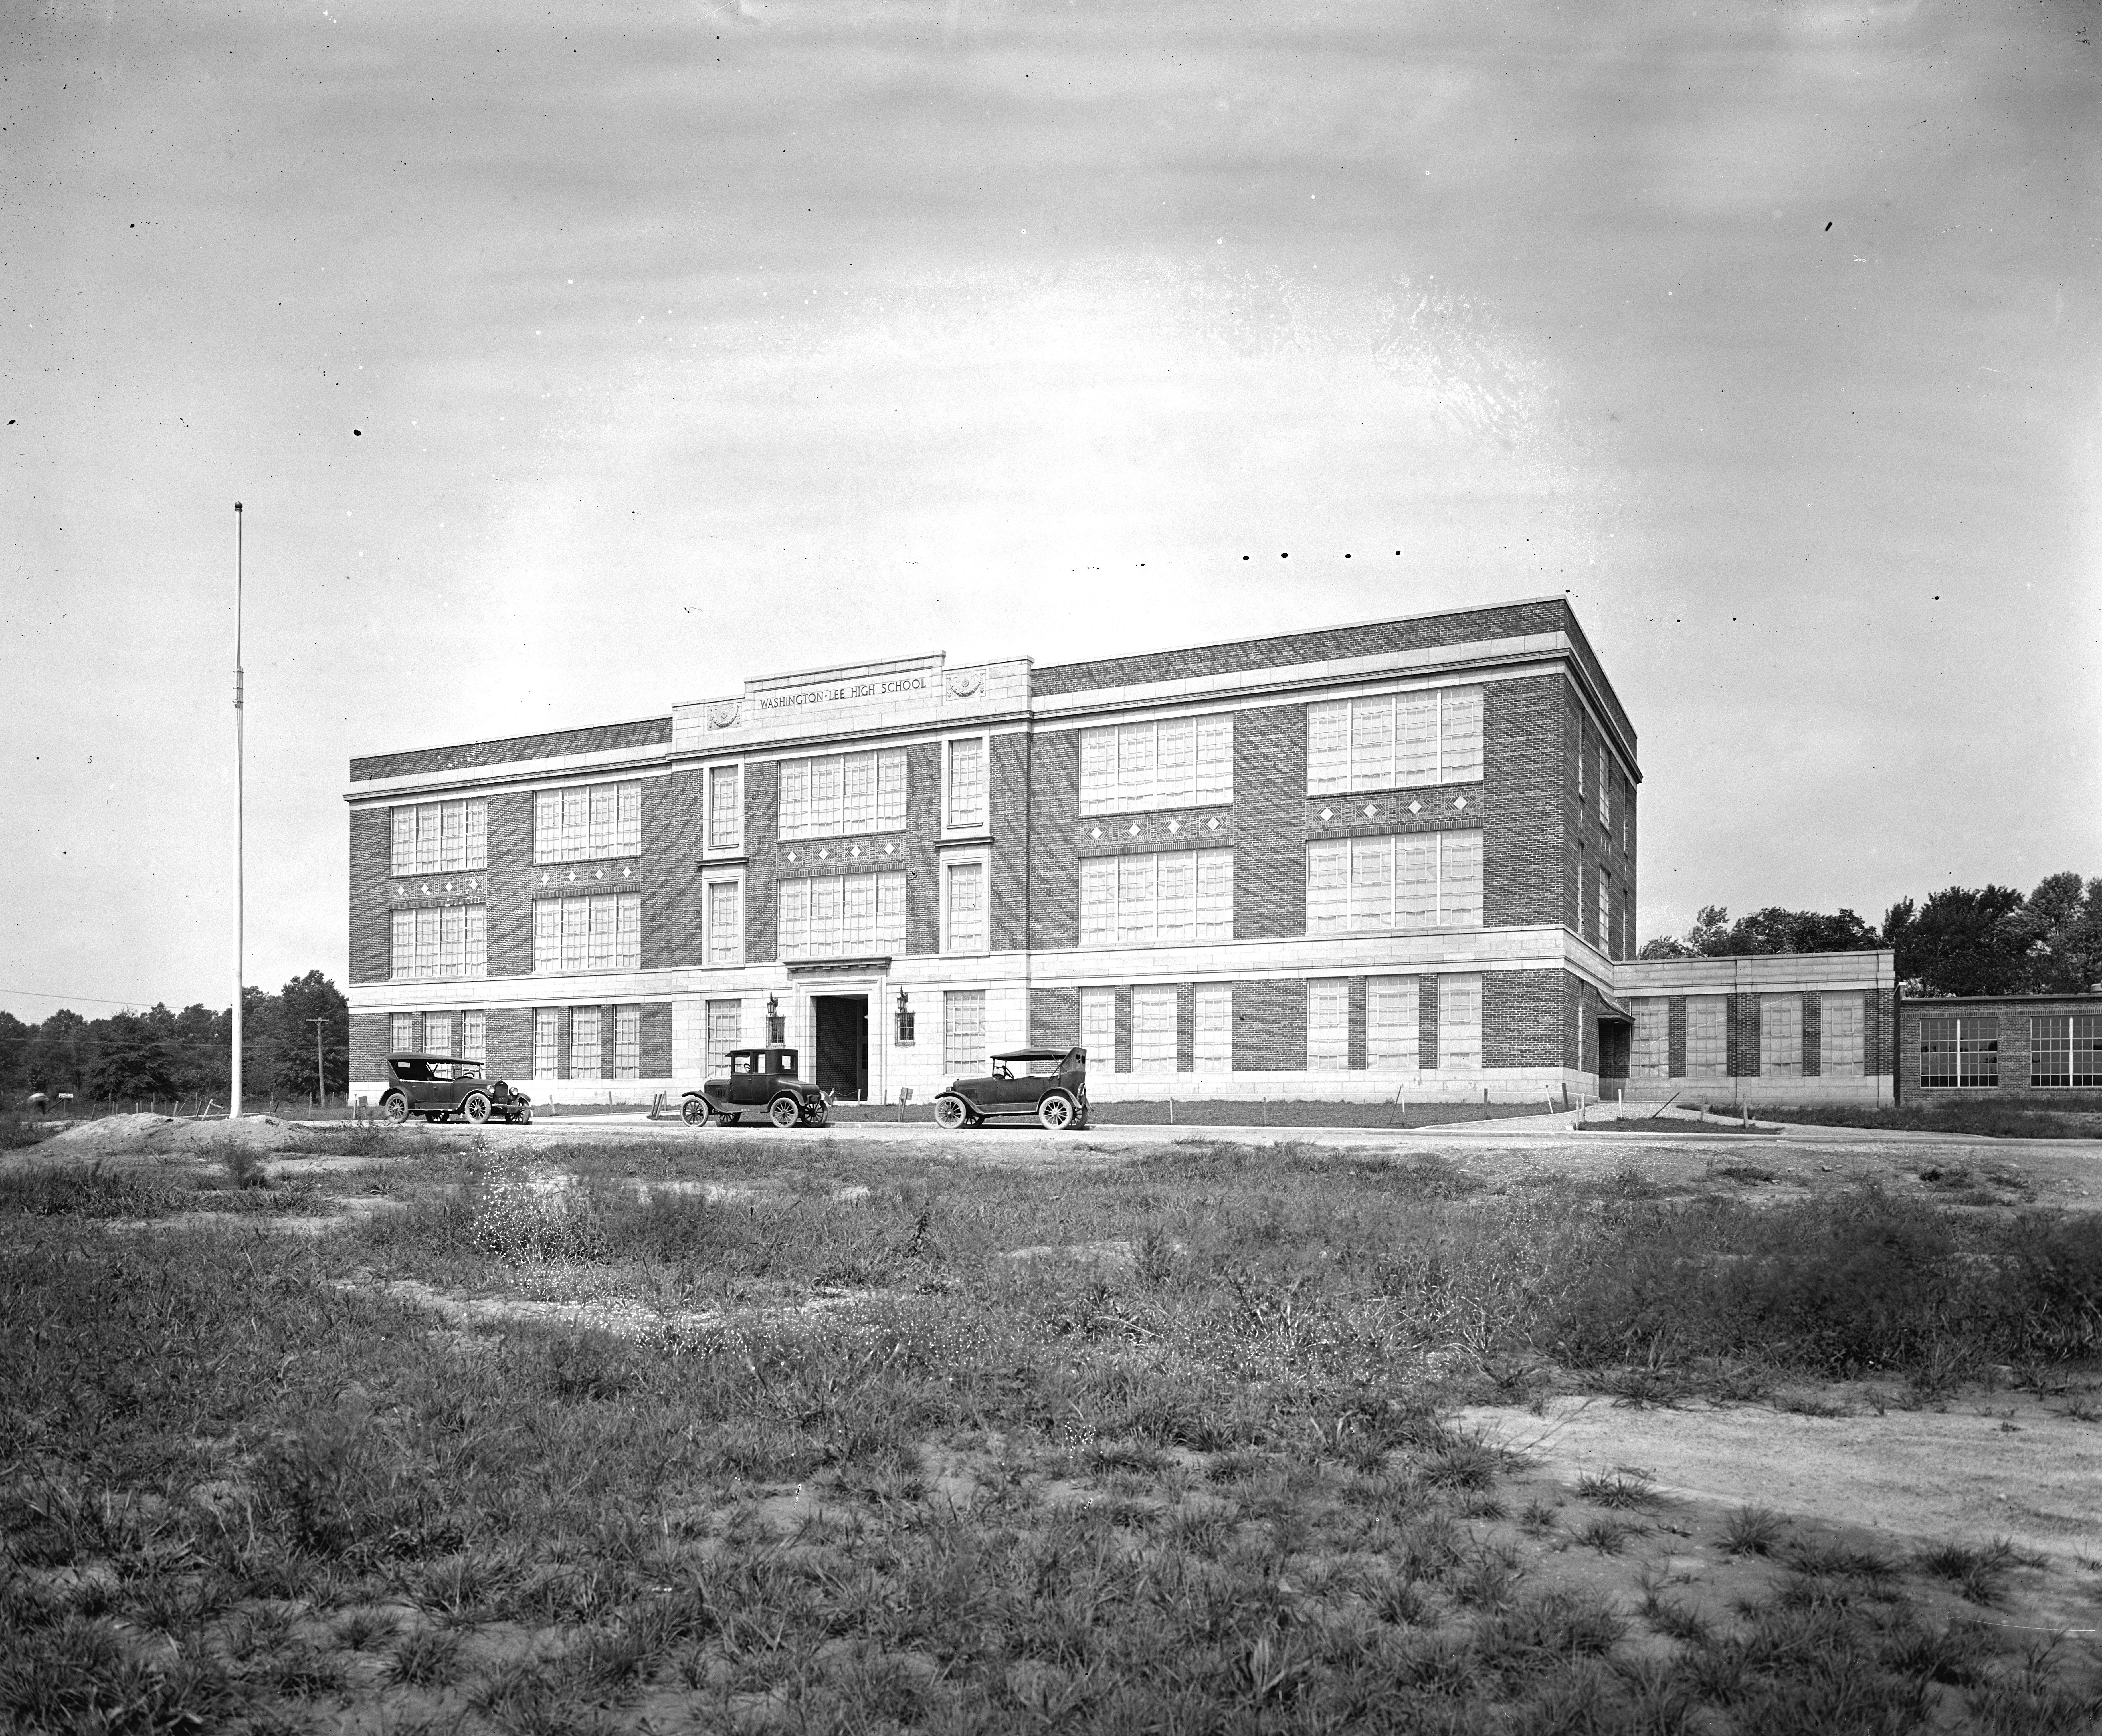 fairfax virginia anchorage motel nice 1950s cars postcard